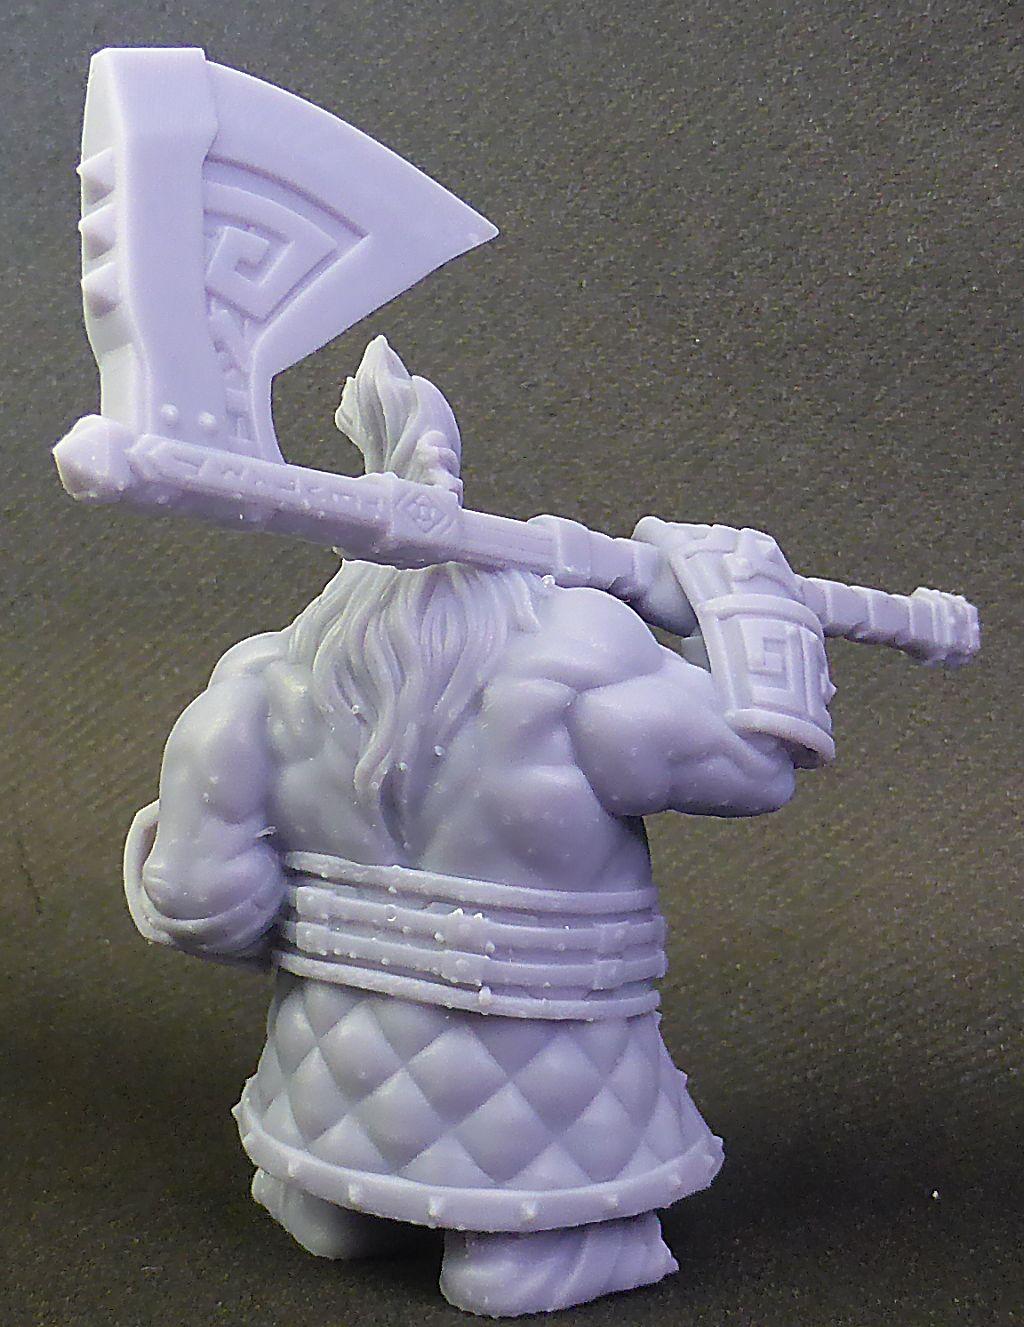 Impression 3D Résine - Figurine de Nain Nain-015